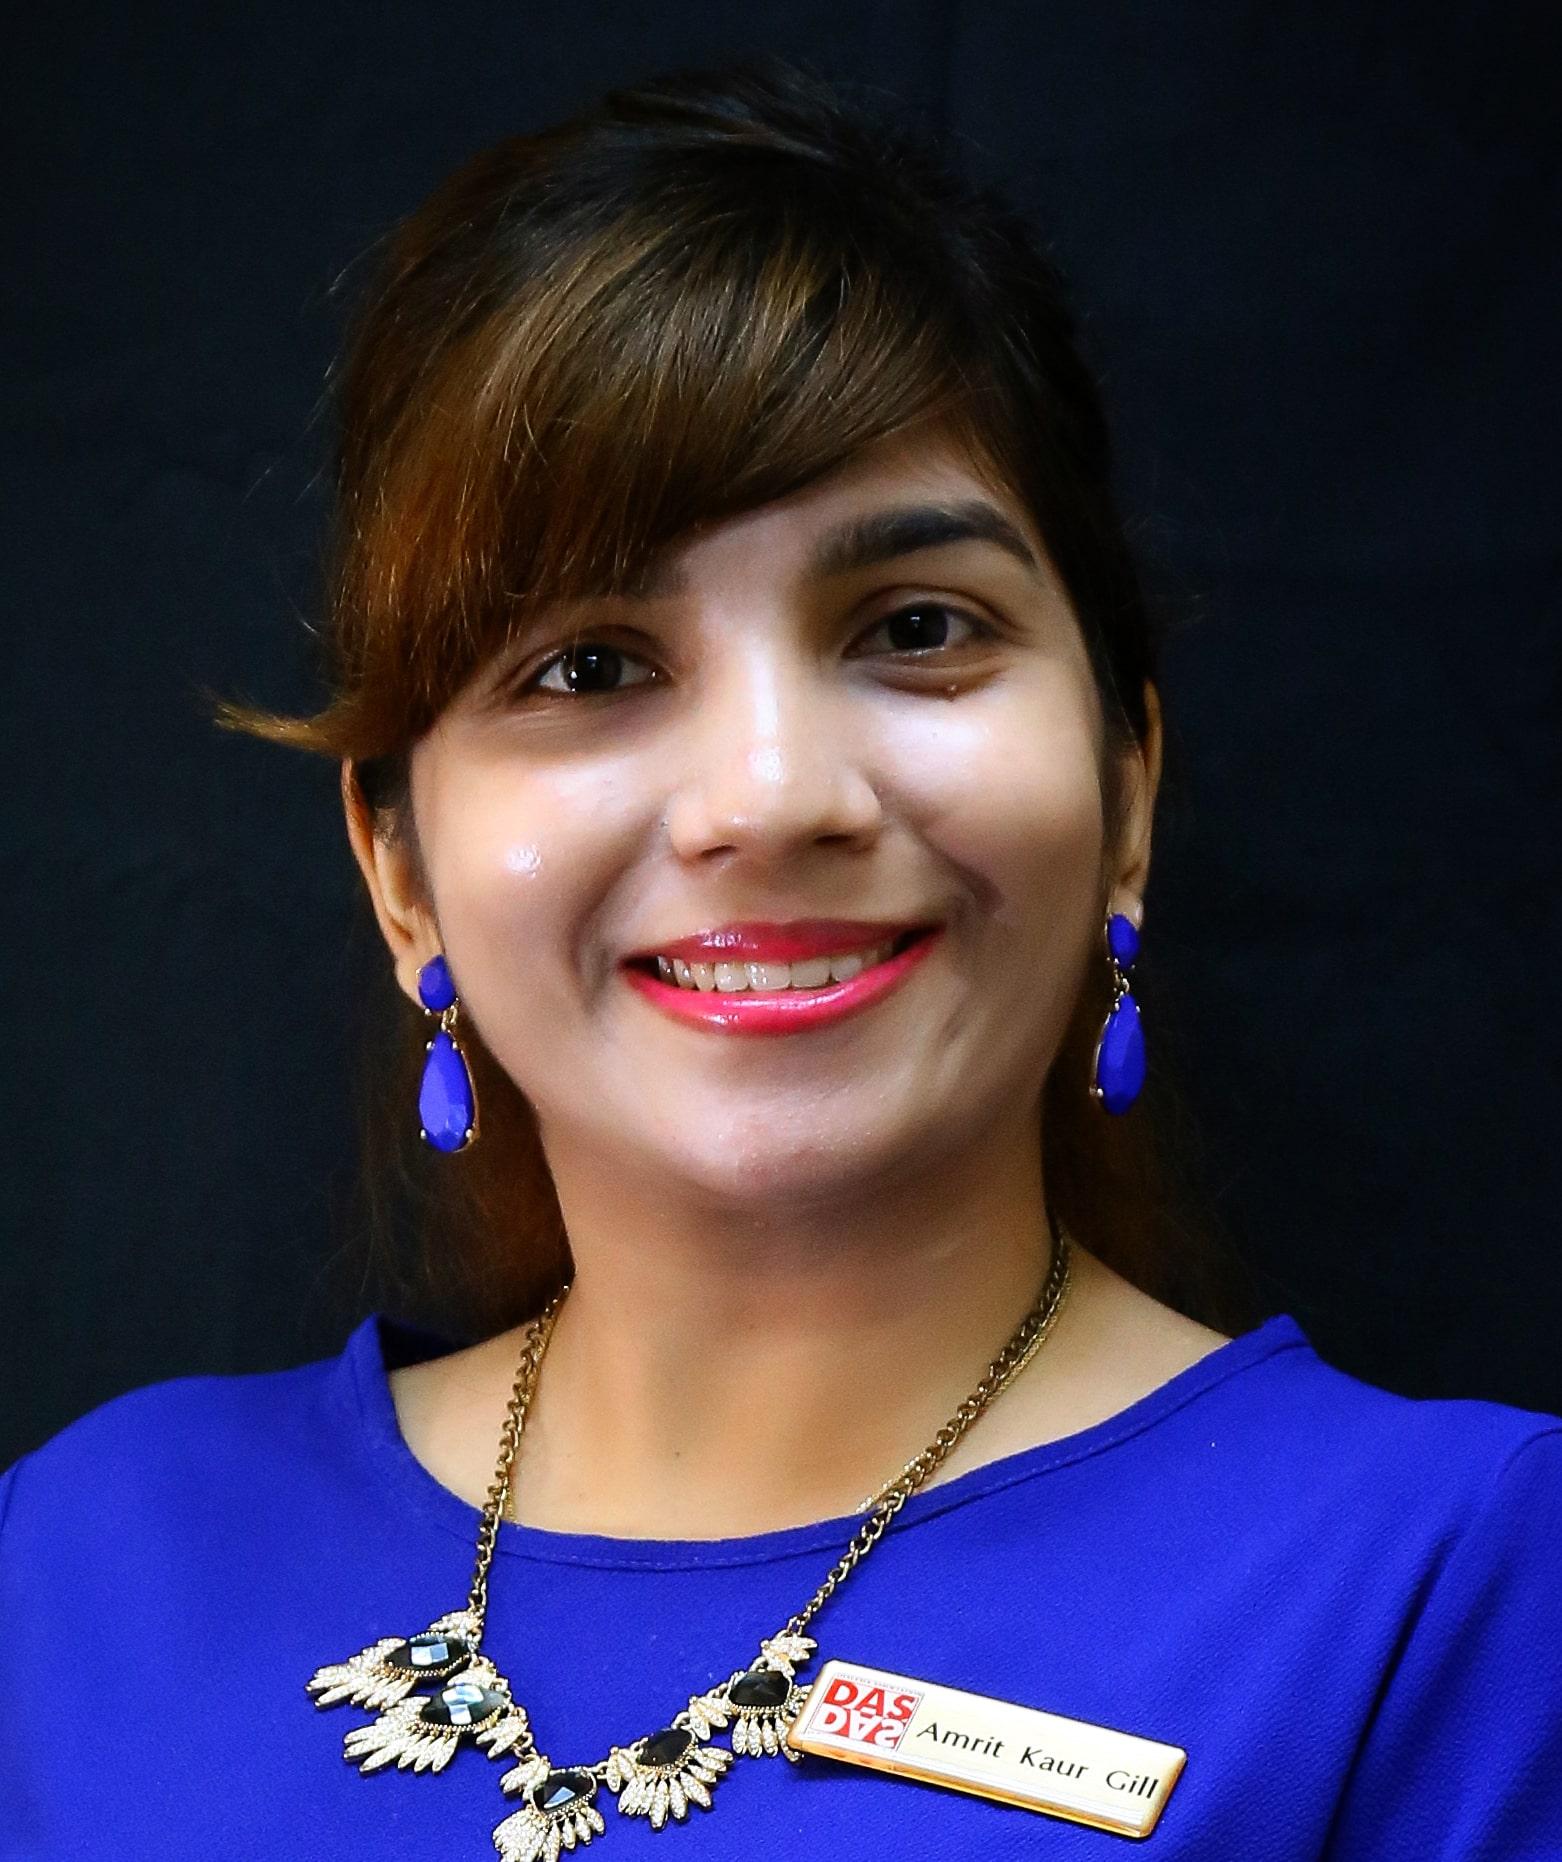 Amrit Kaur Gill